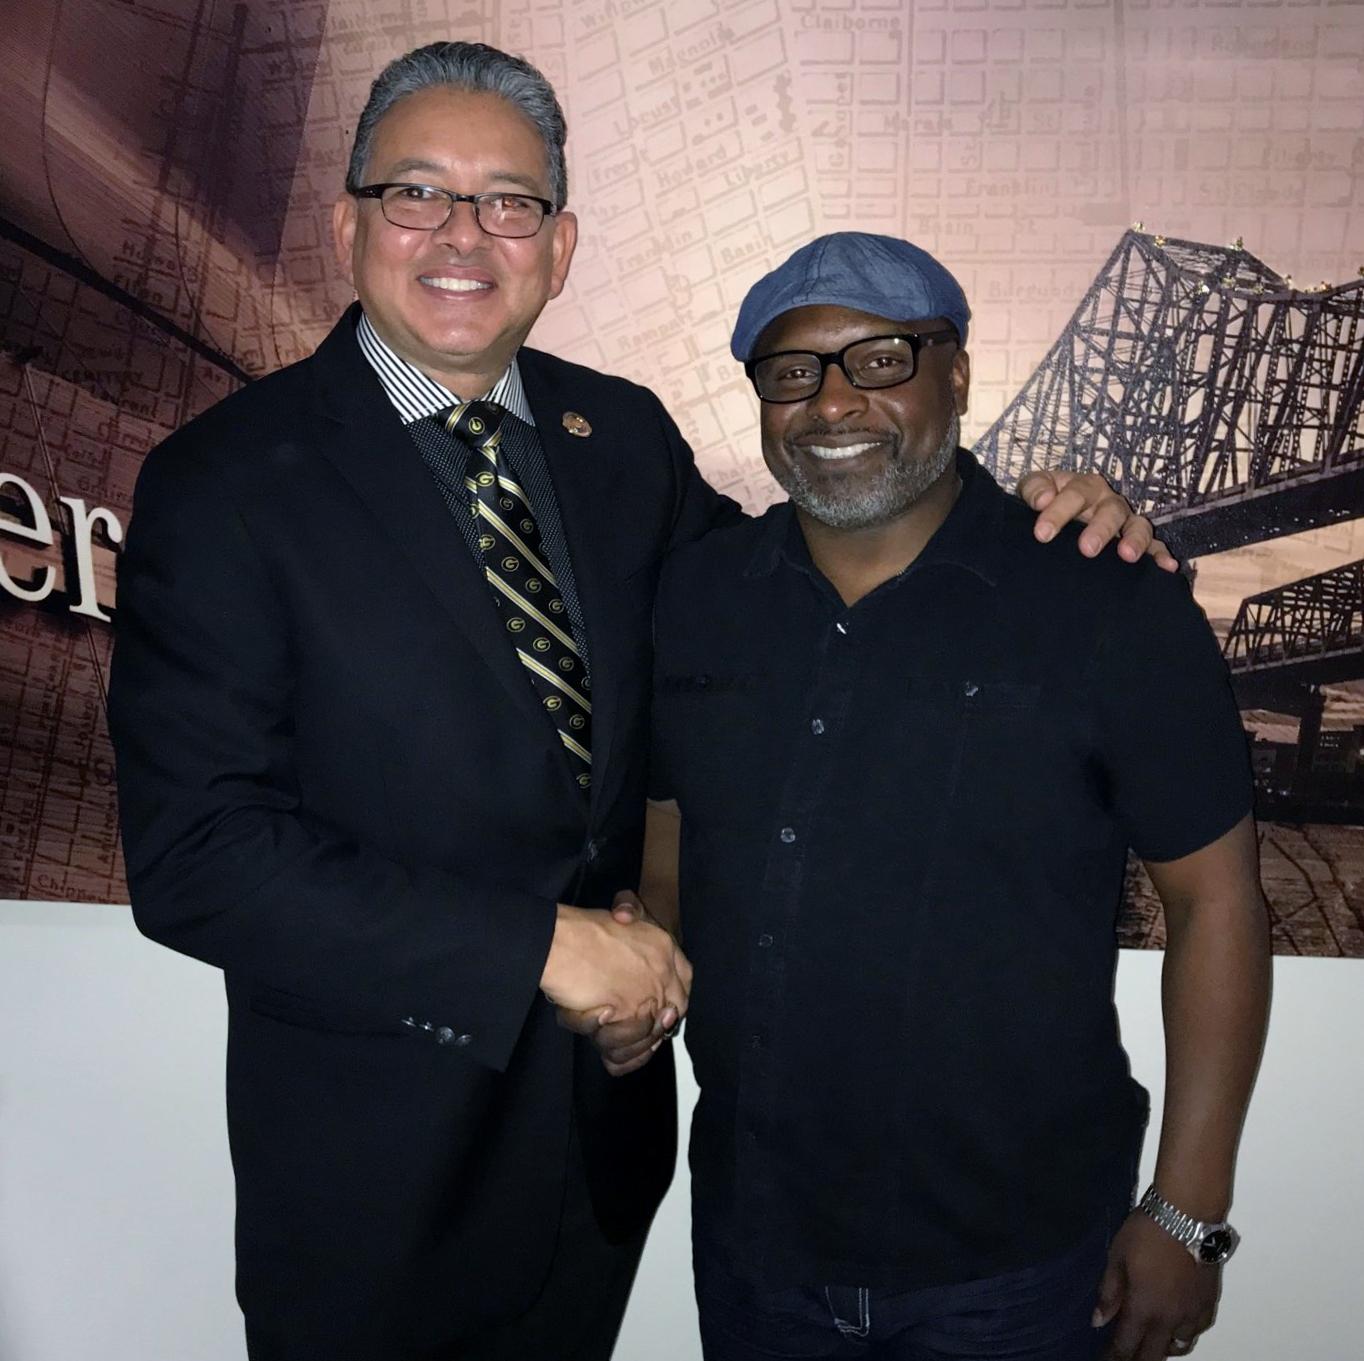 President Rick Gallo of Grambling State University with Pastor Theron Jackson